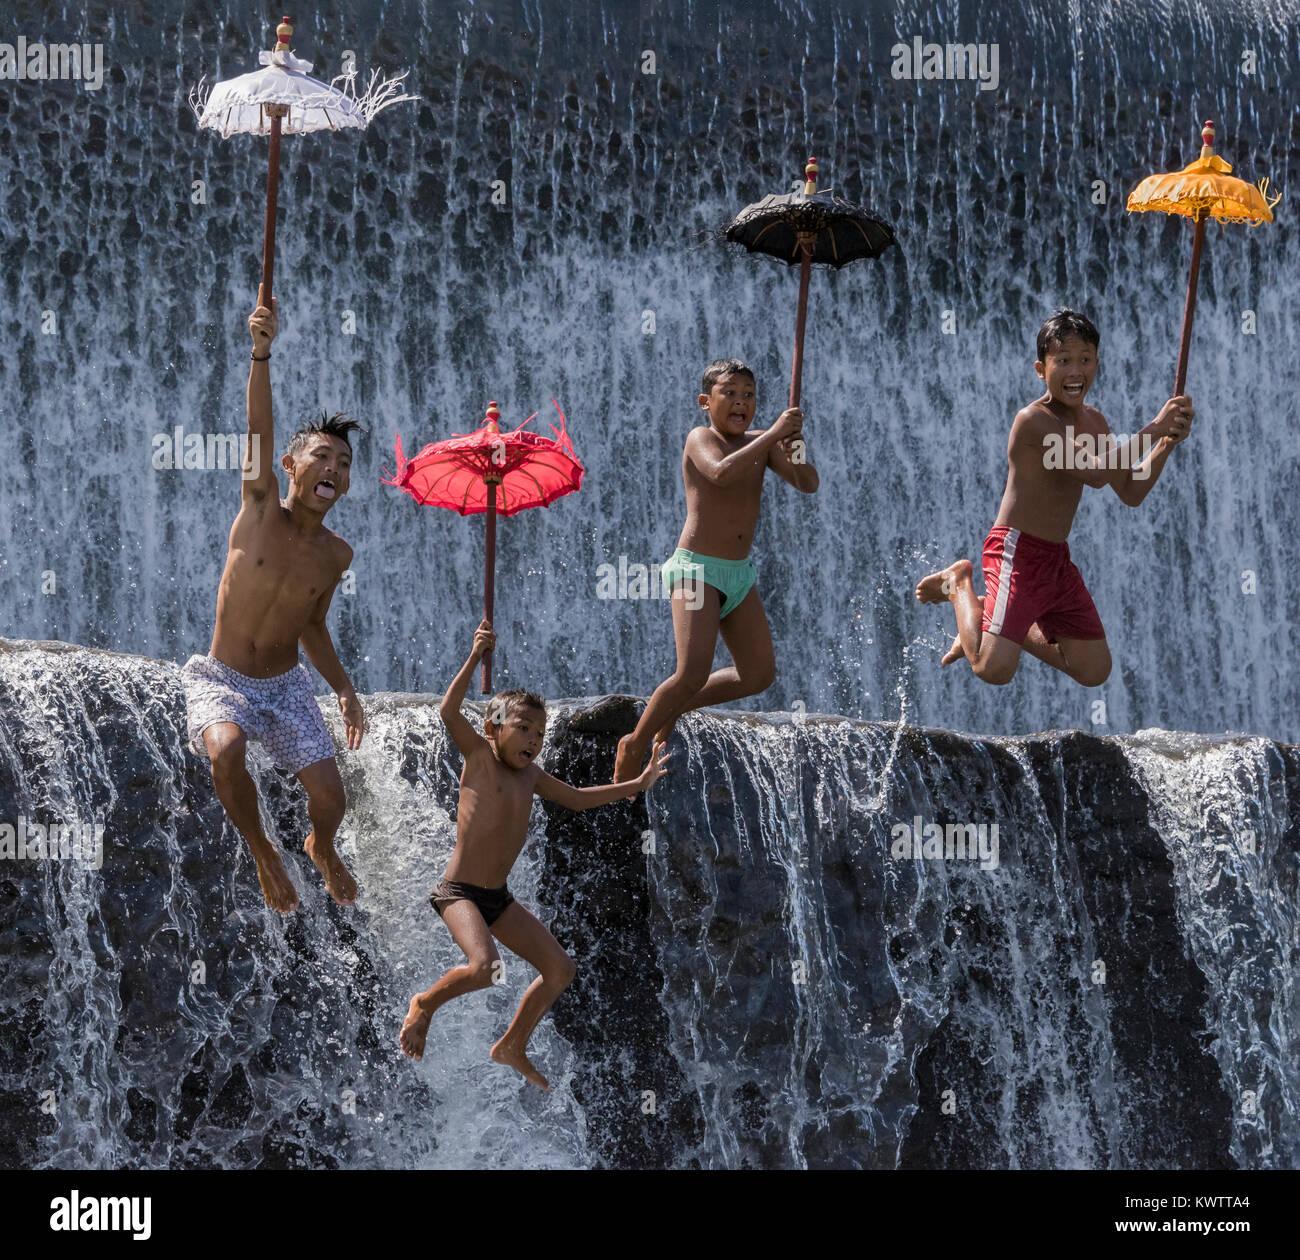 Boys leaping off a dam, Tukad Unda Dam, Semarapura, Bali Island, Indonesia - Stock Image